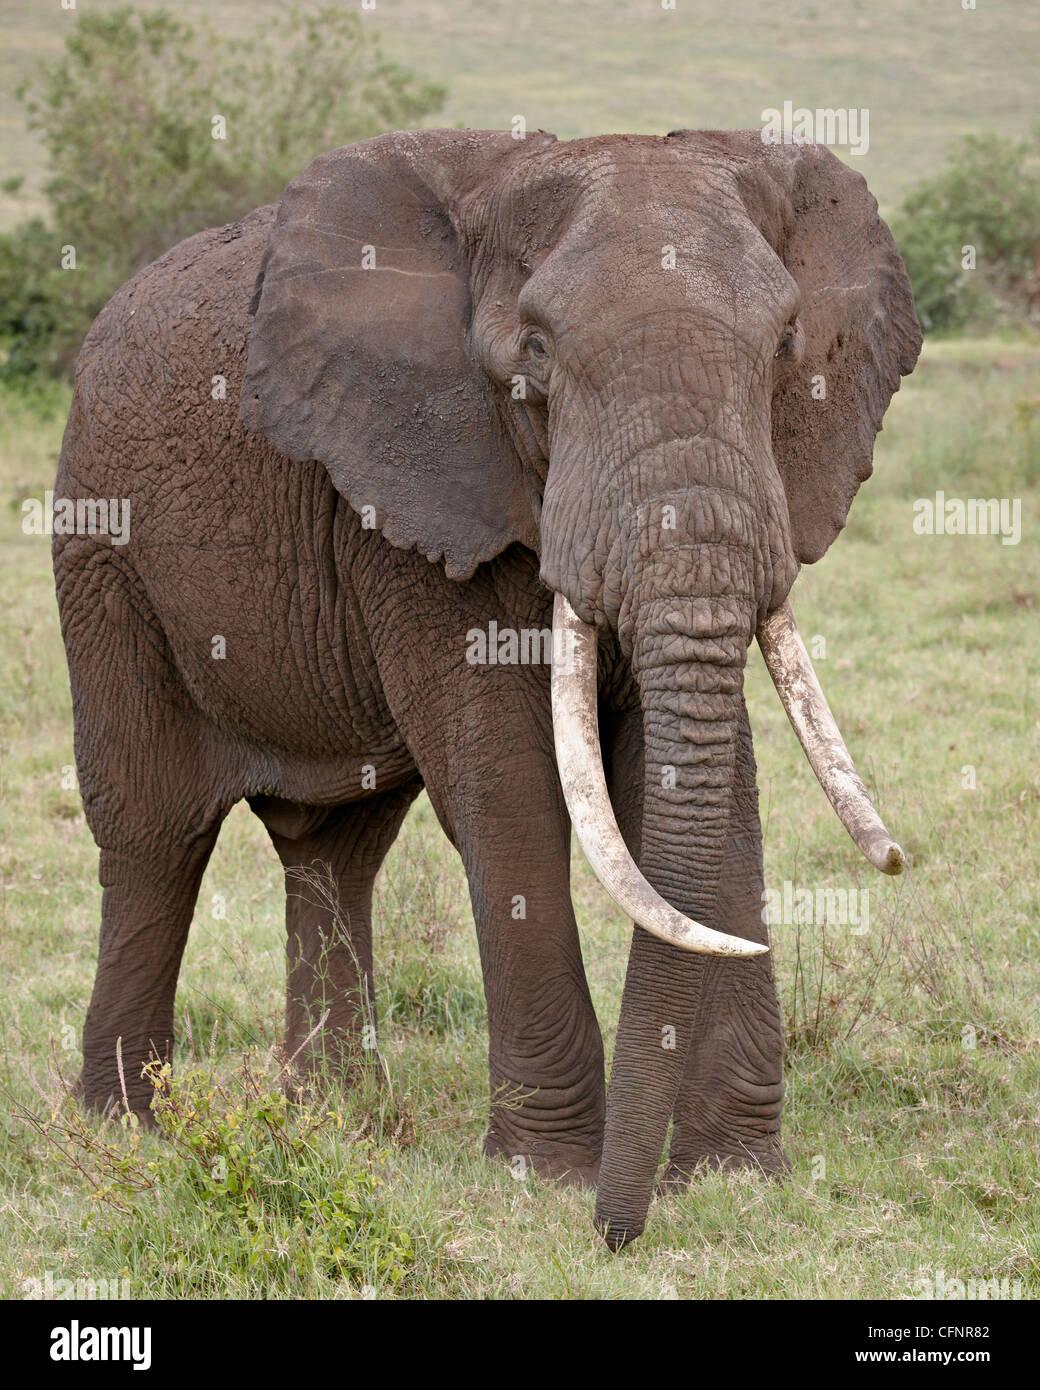 African elephant (Loxodonta africana),Tanzania, East Africa, Africa - Stock Image